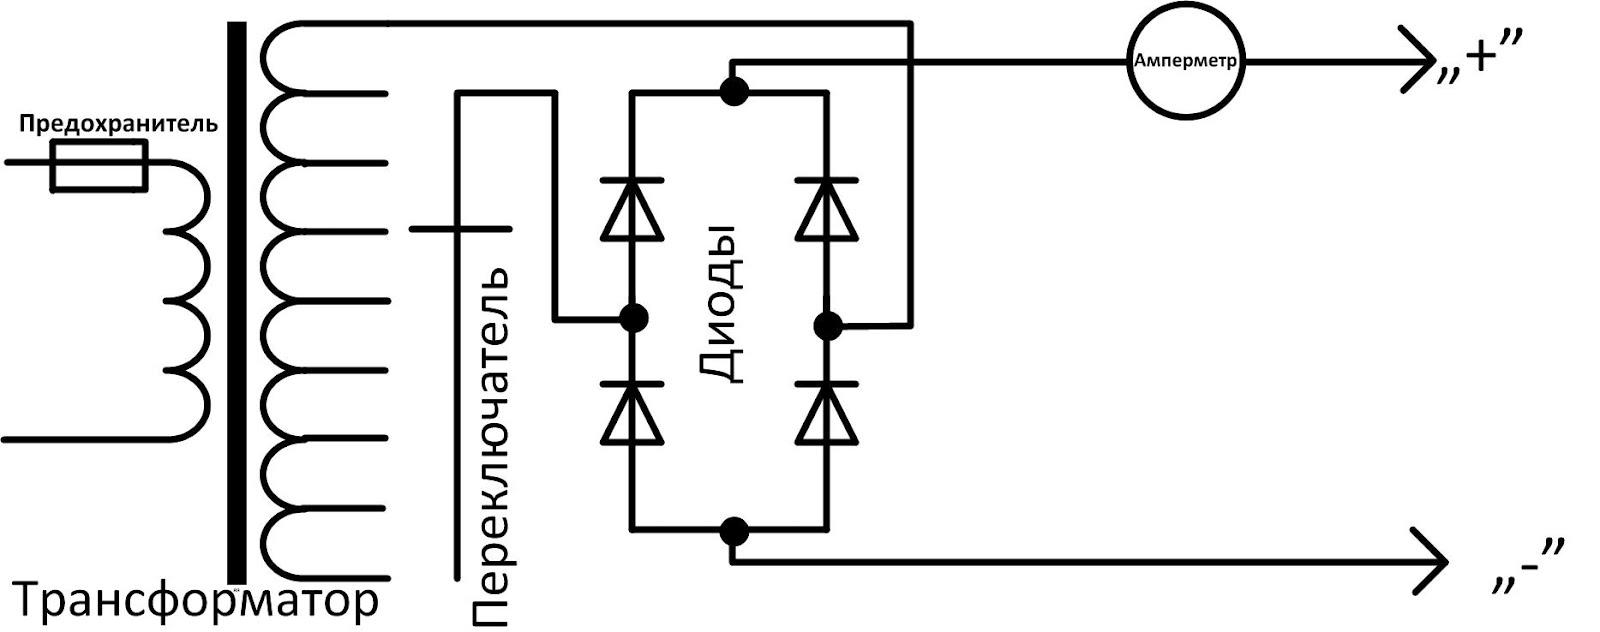 Схема зарядки аккумулятора своими руками на трансформаторе